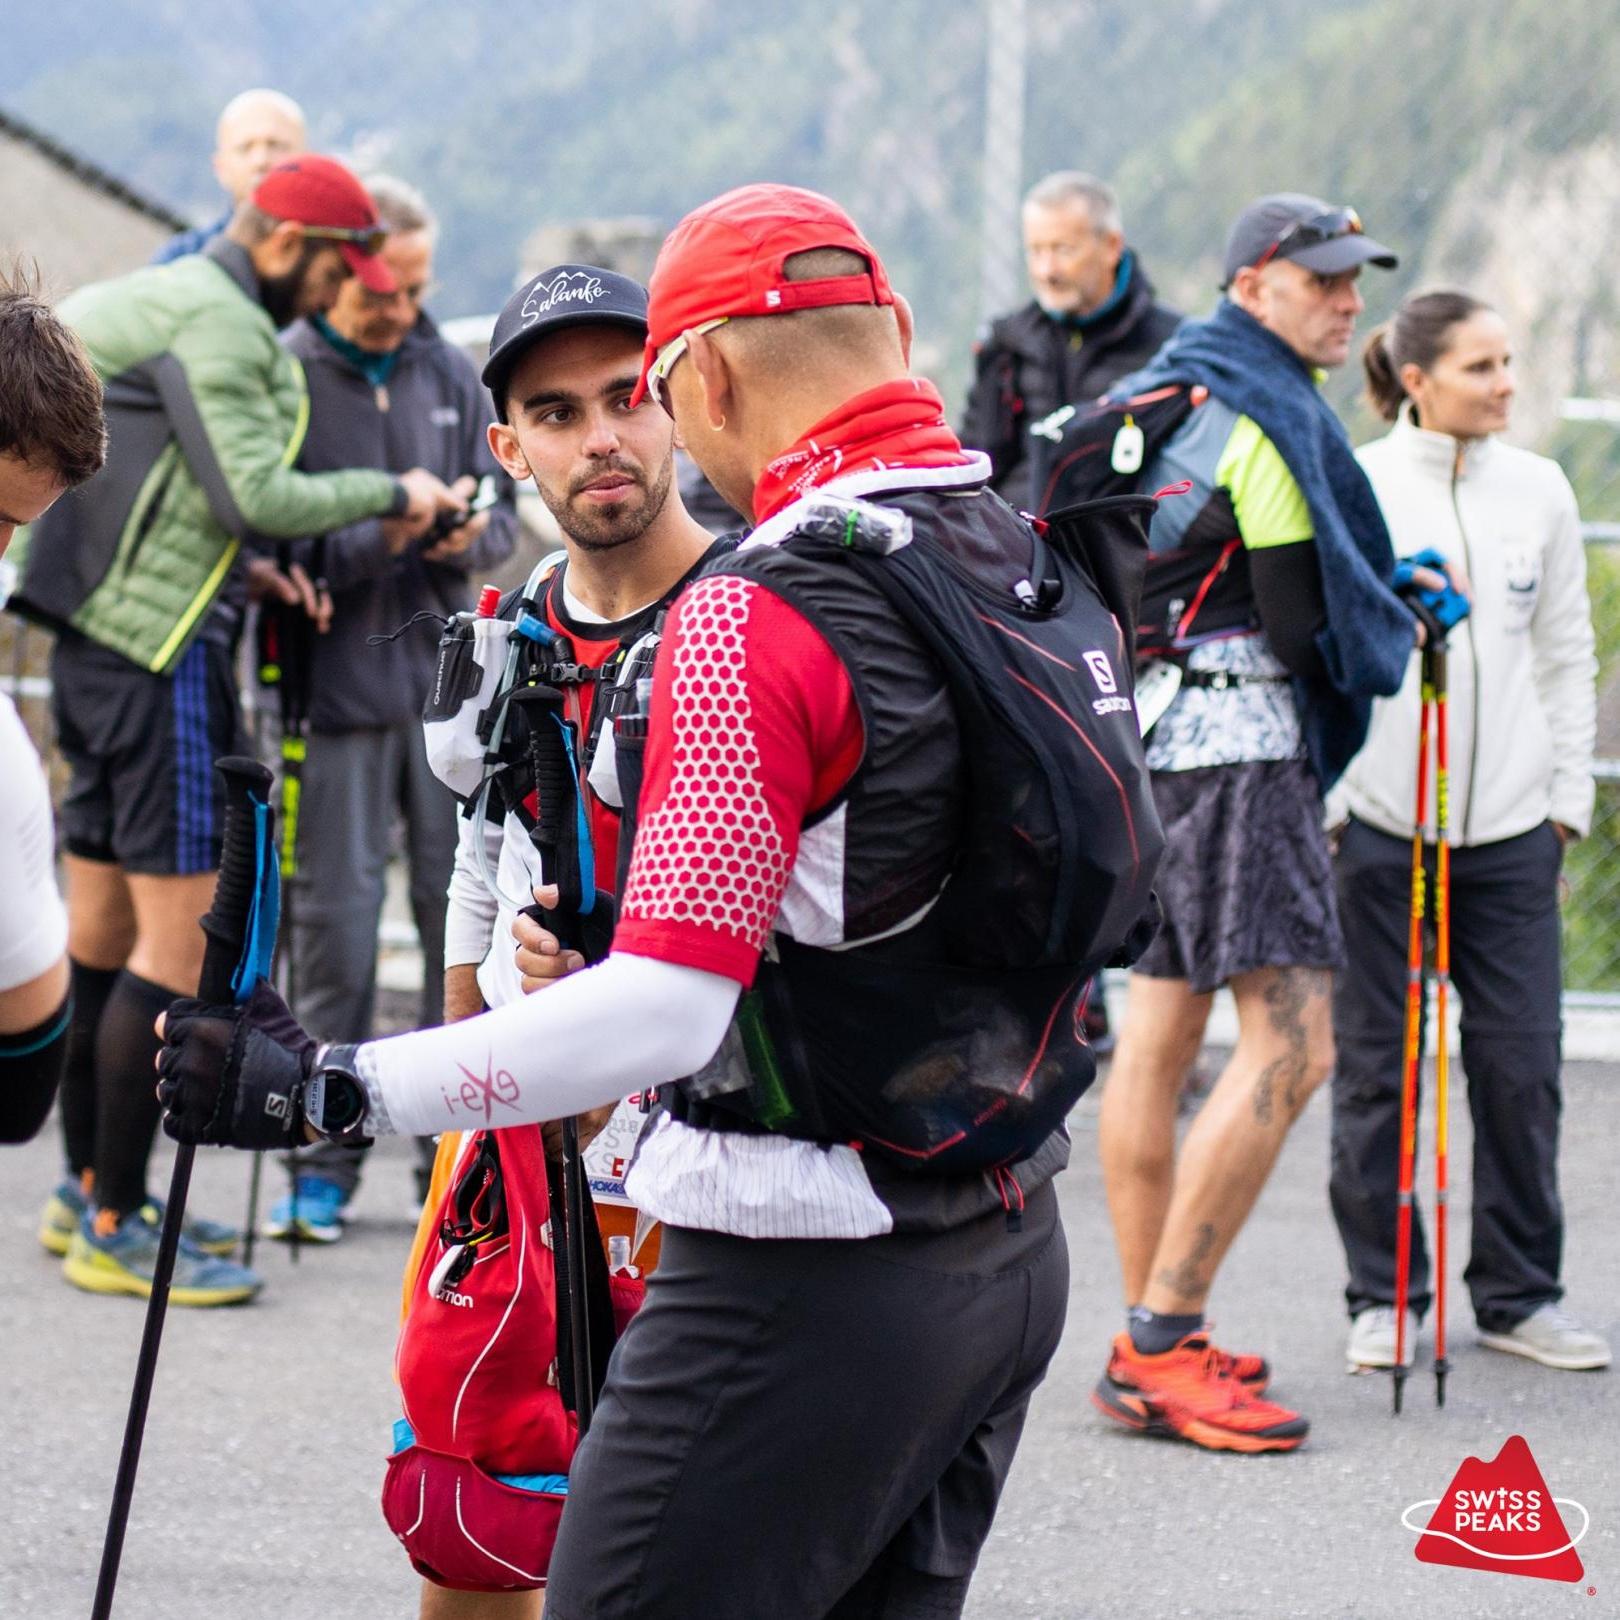 SwissPeaks+Trail_Coureurs+discutent.jpg